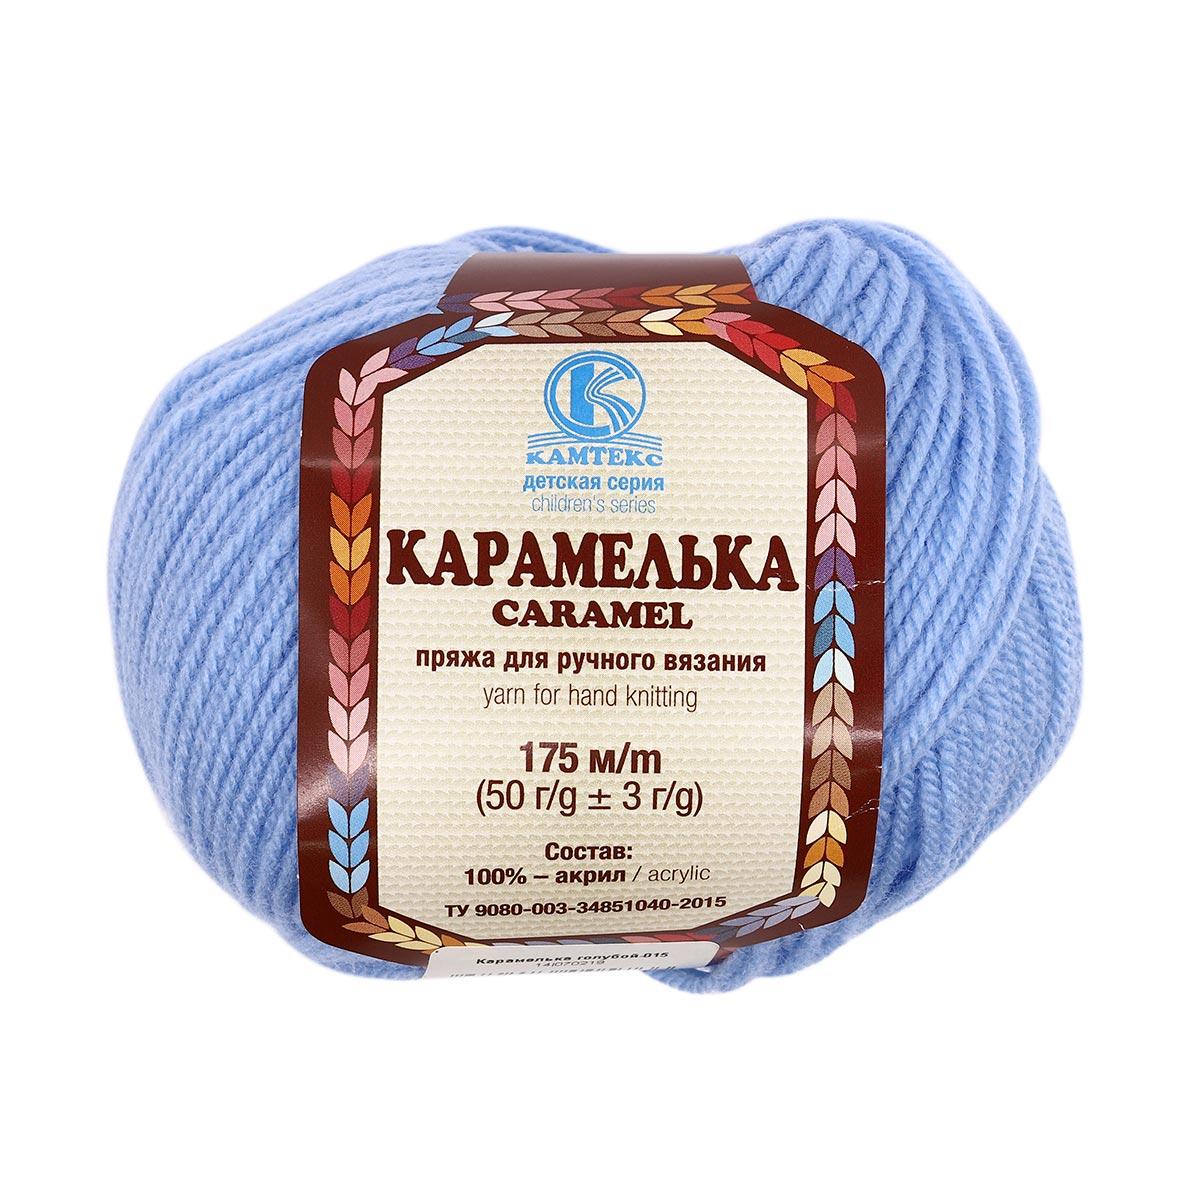 Пряжа Камтекс 'Карамелька' 50гр.175м. (100% акрил) (015 голубой)